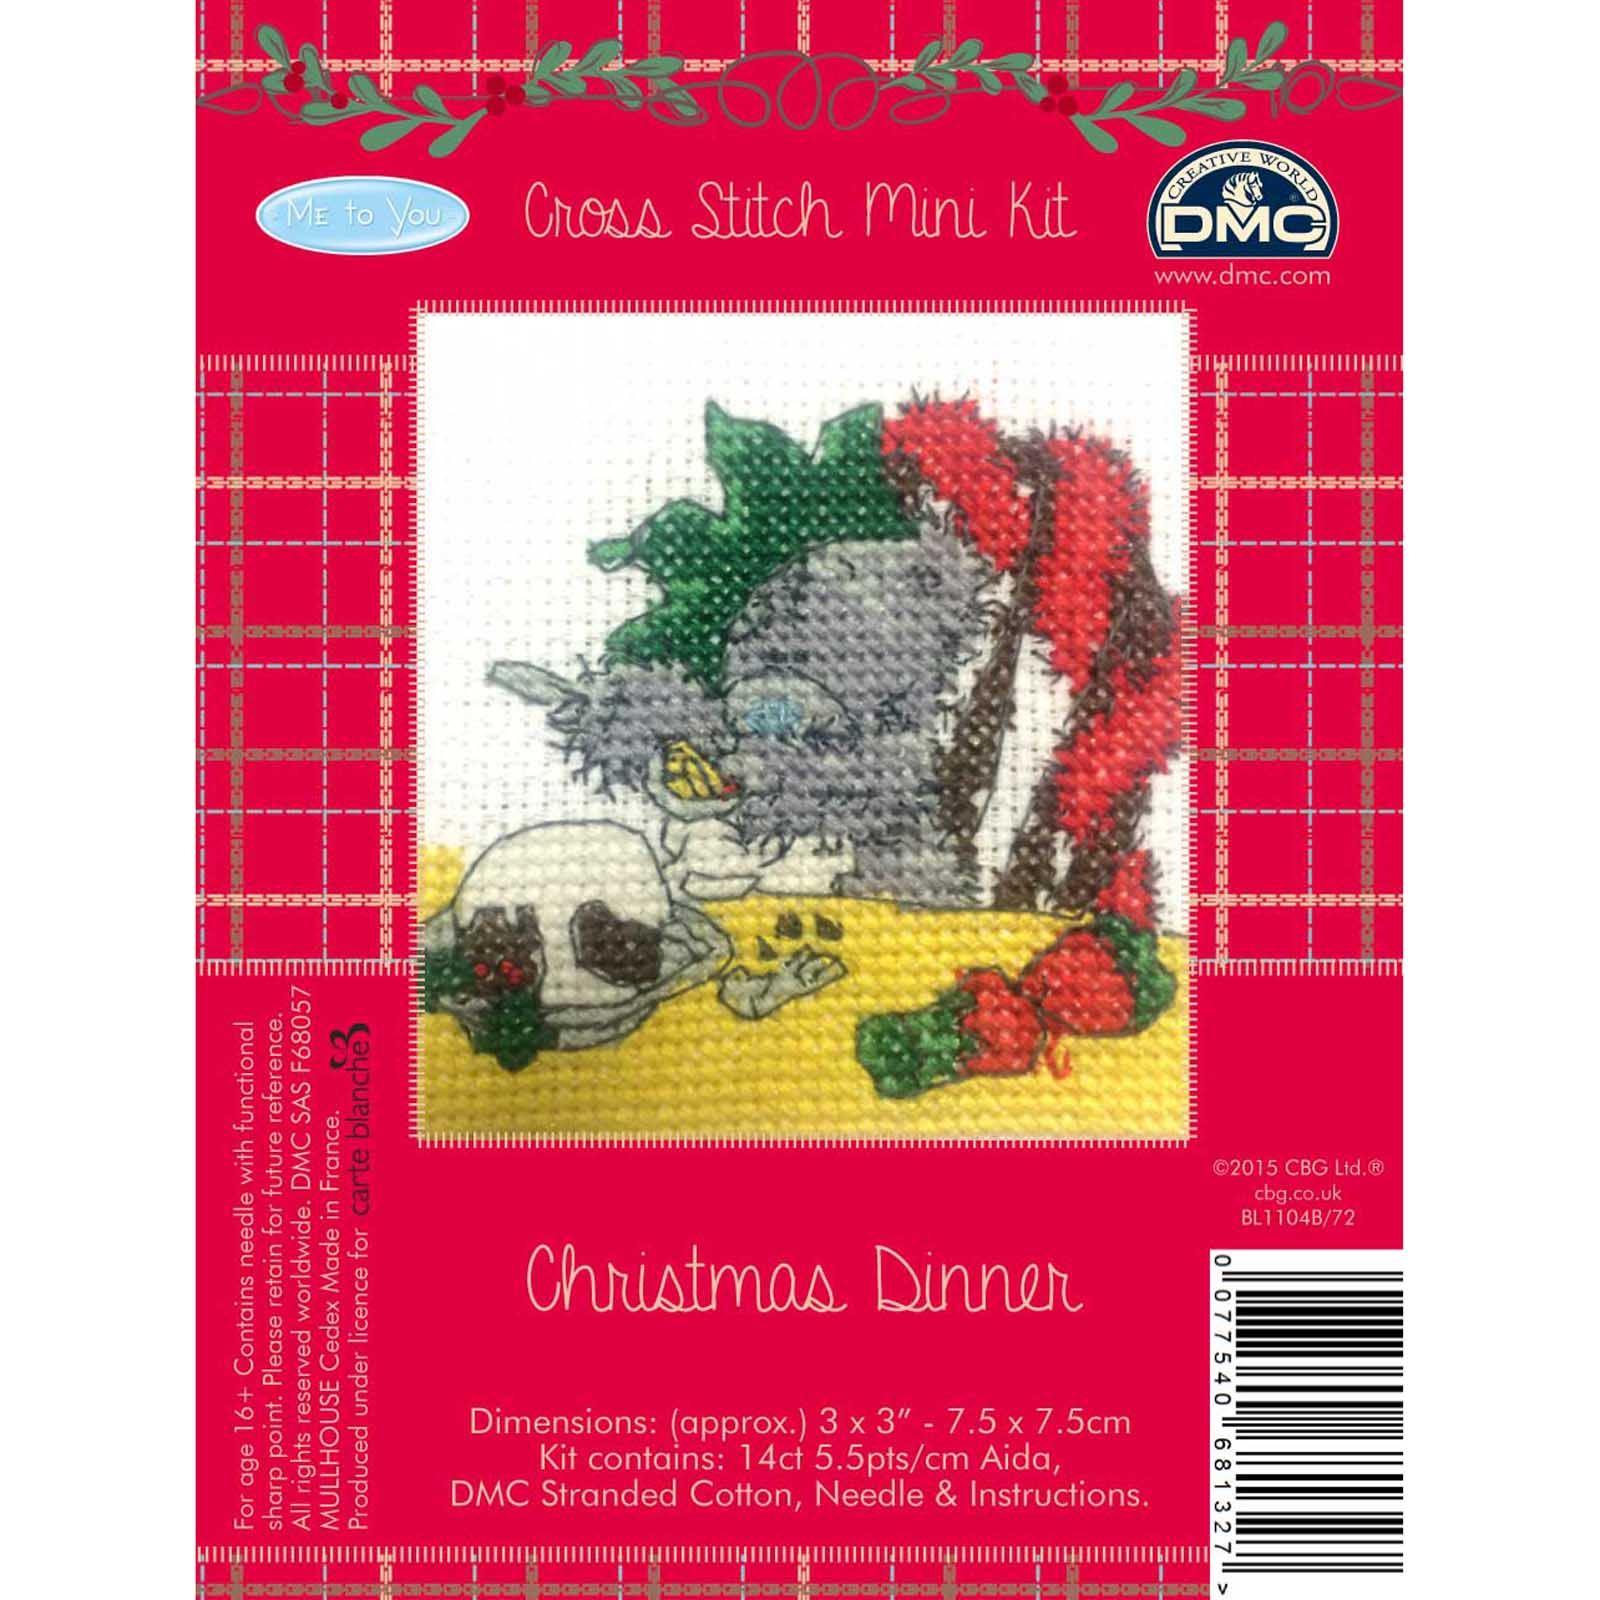 DMC-Me-to-You-Tatty-Teddy-Christmas-Mini-Cross-Stitch-Kits-8-Designs thumbnail 7